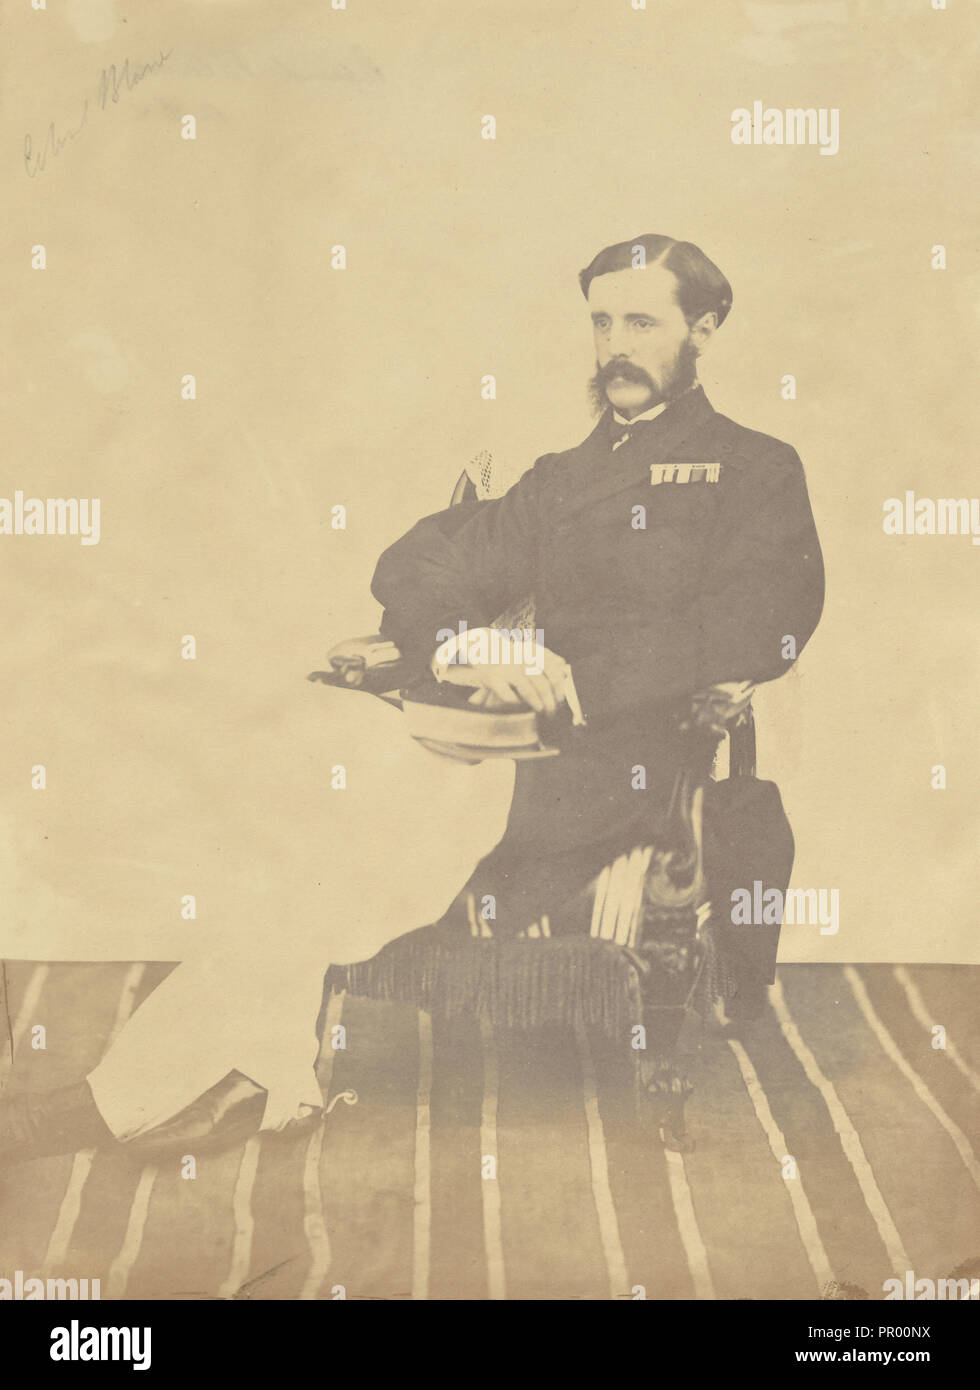 Colonel Seymour Blane, A.D.C; India; 1858 - 1869; Albumen silver print - Stock Image